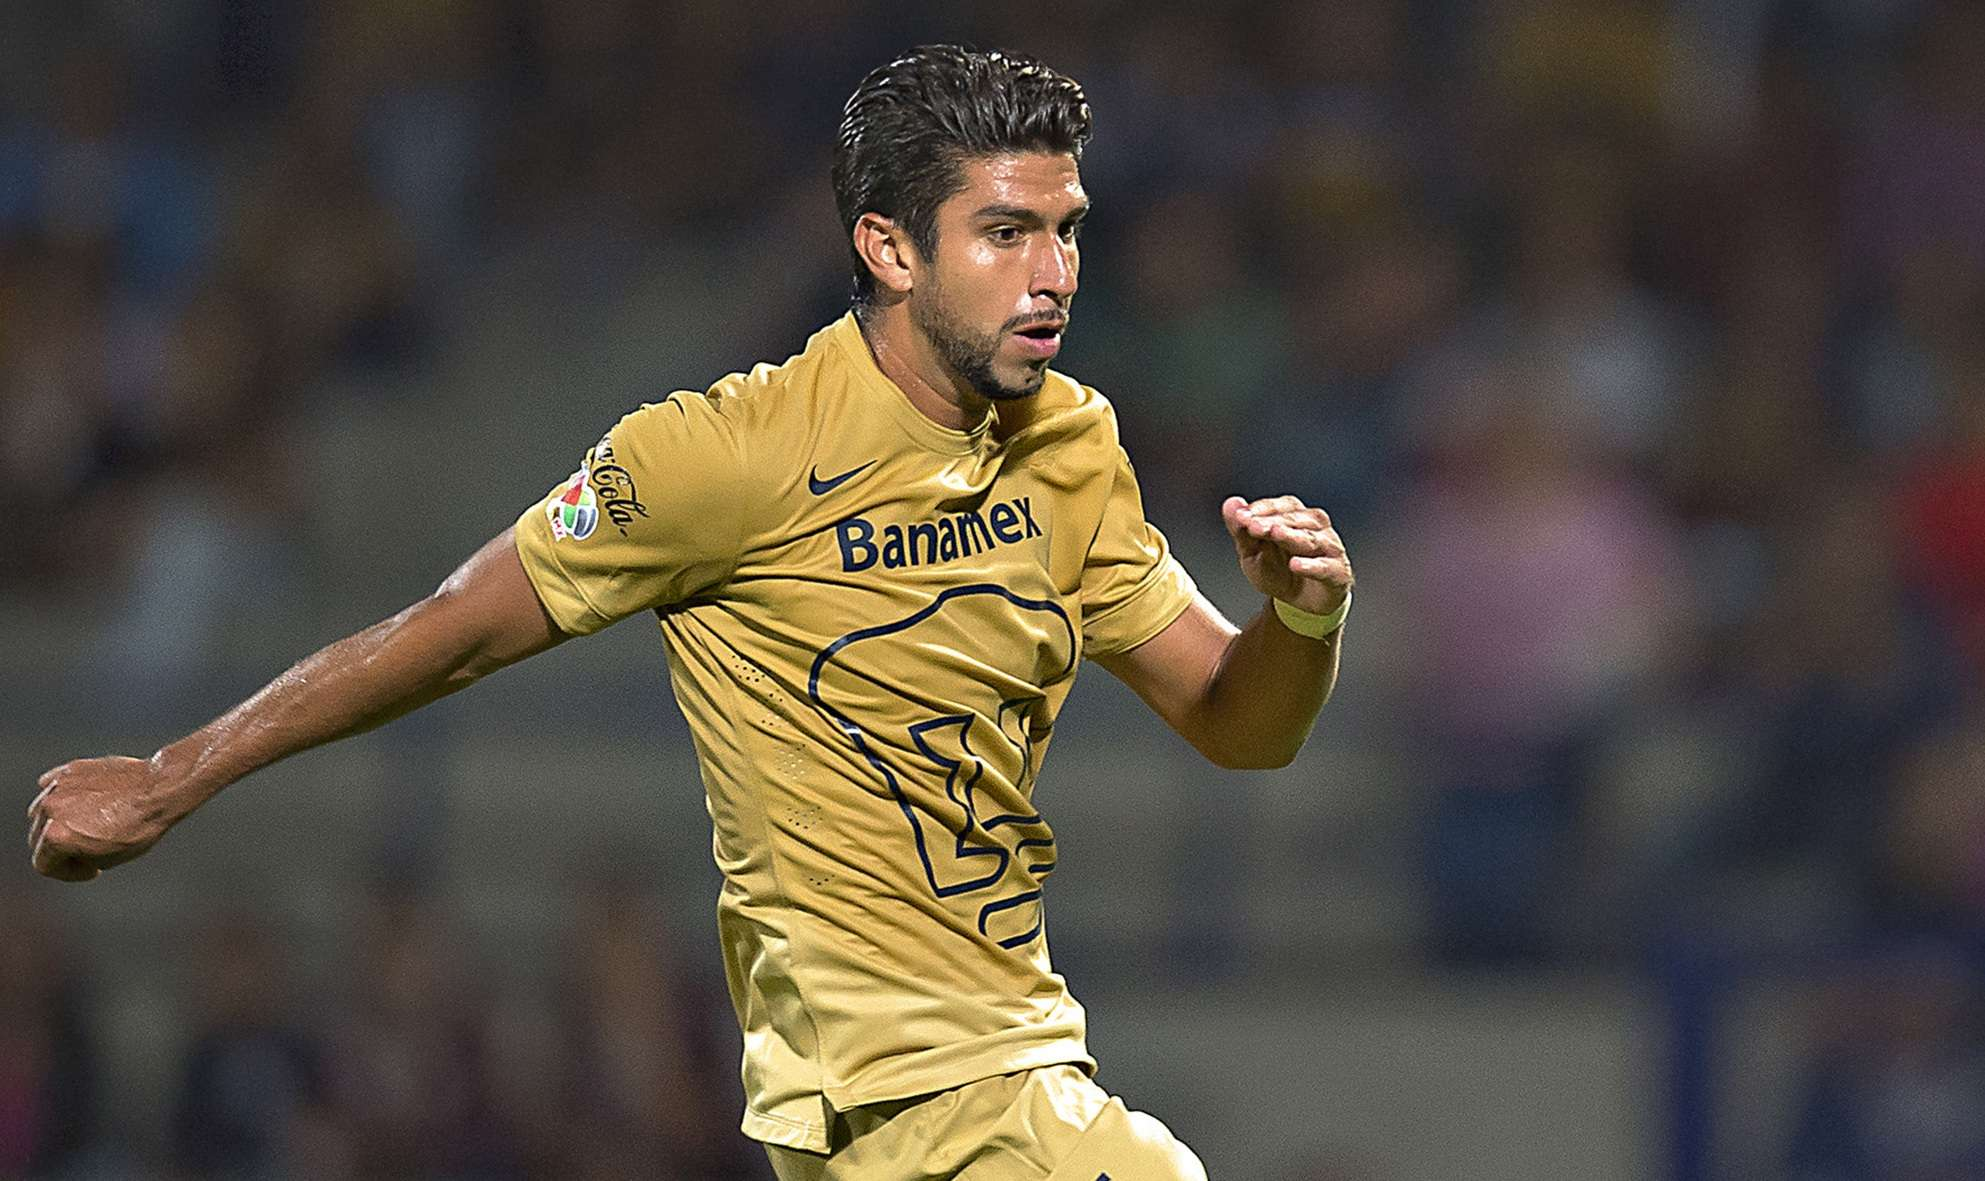 Eduardo Herrera marcó un gol en el empate de Pumas 2-2 ante Jaguares. Foto: Mexsport